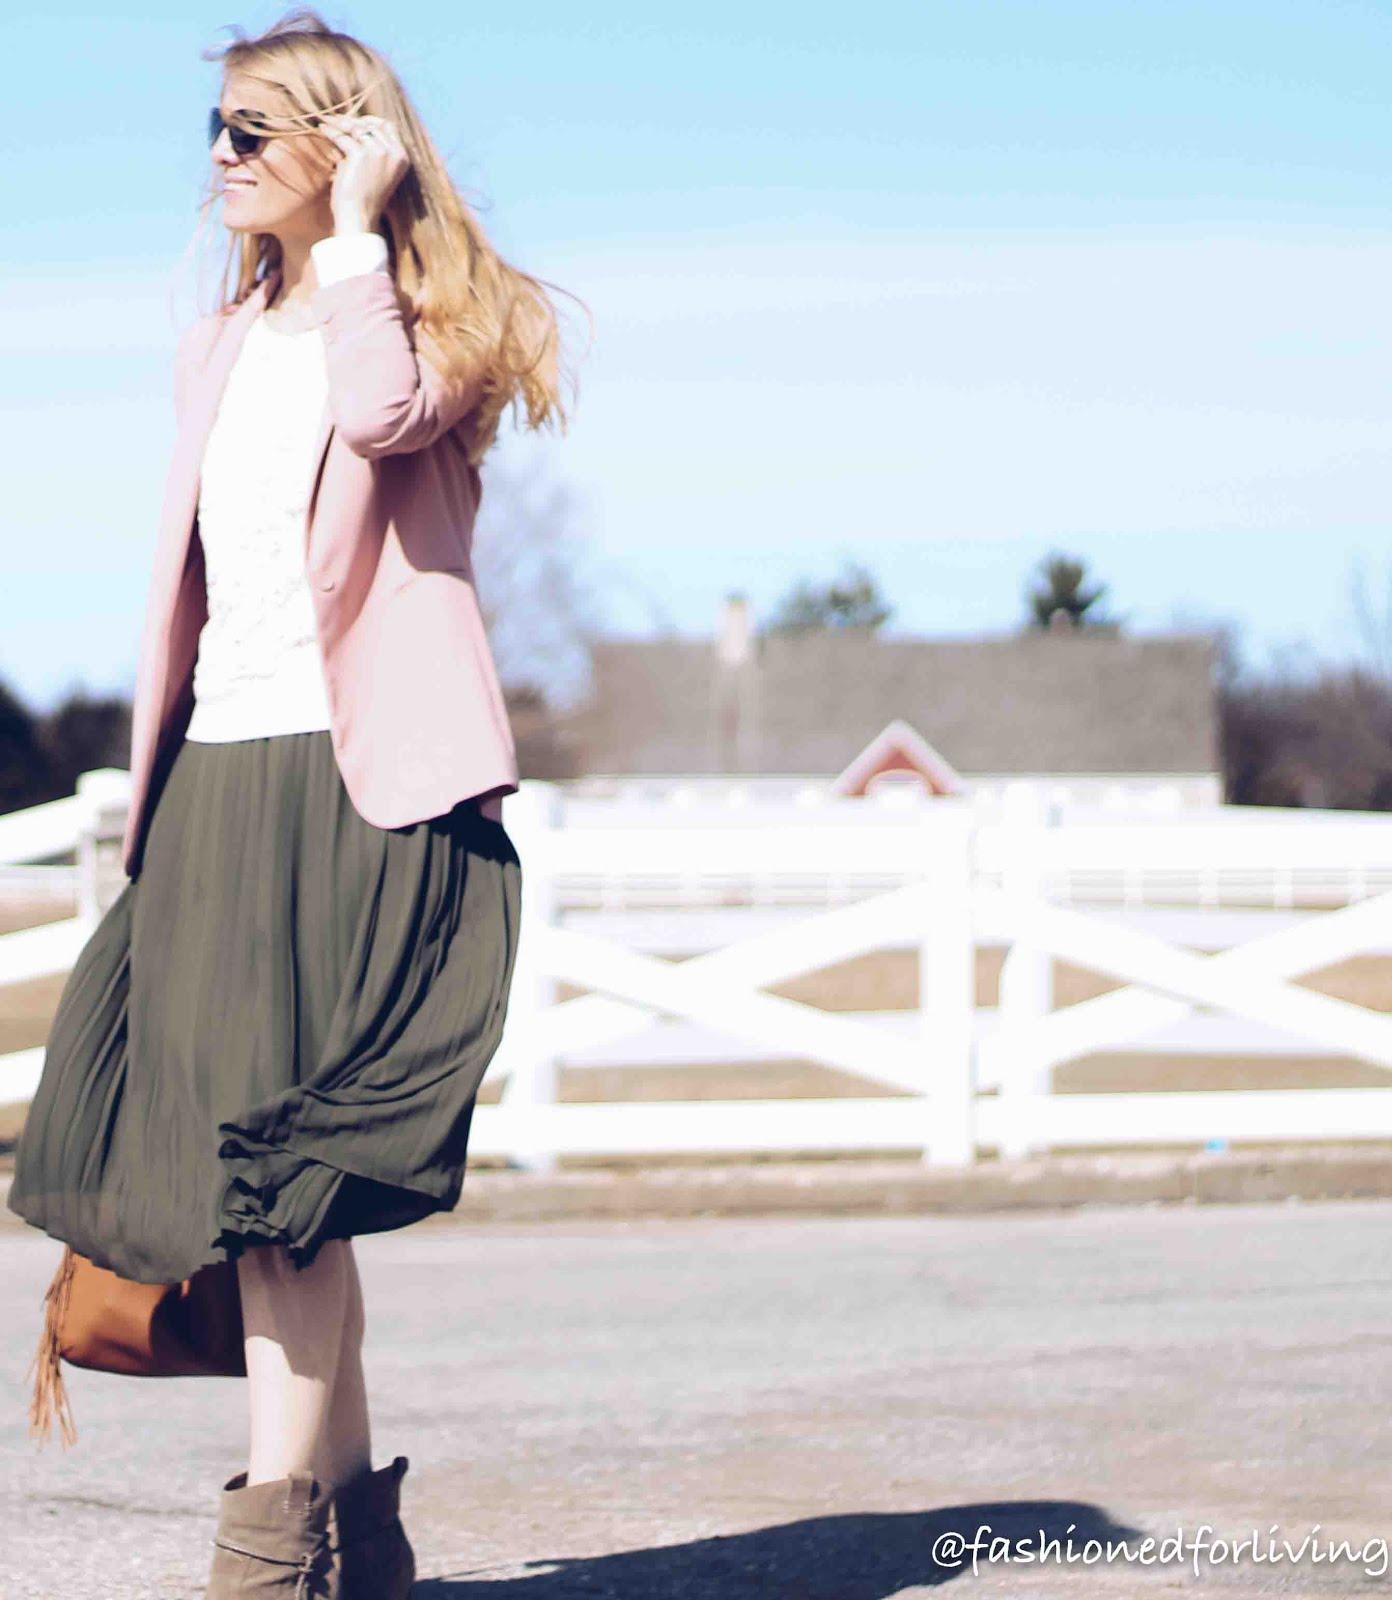 d4fa77e46e66 What To Wear With Pleated Skirt 2017 | Saddha